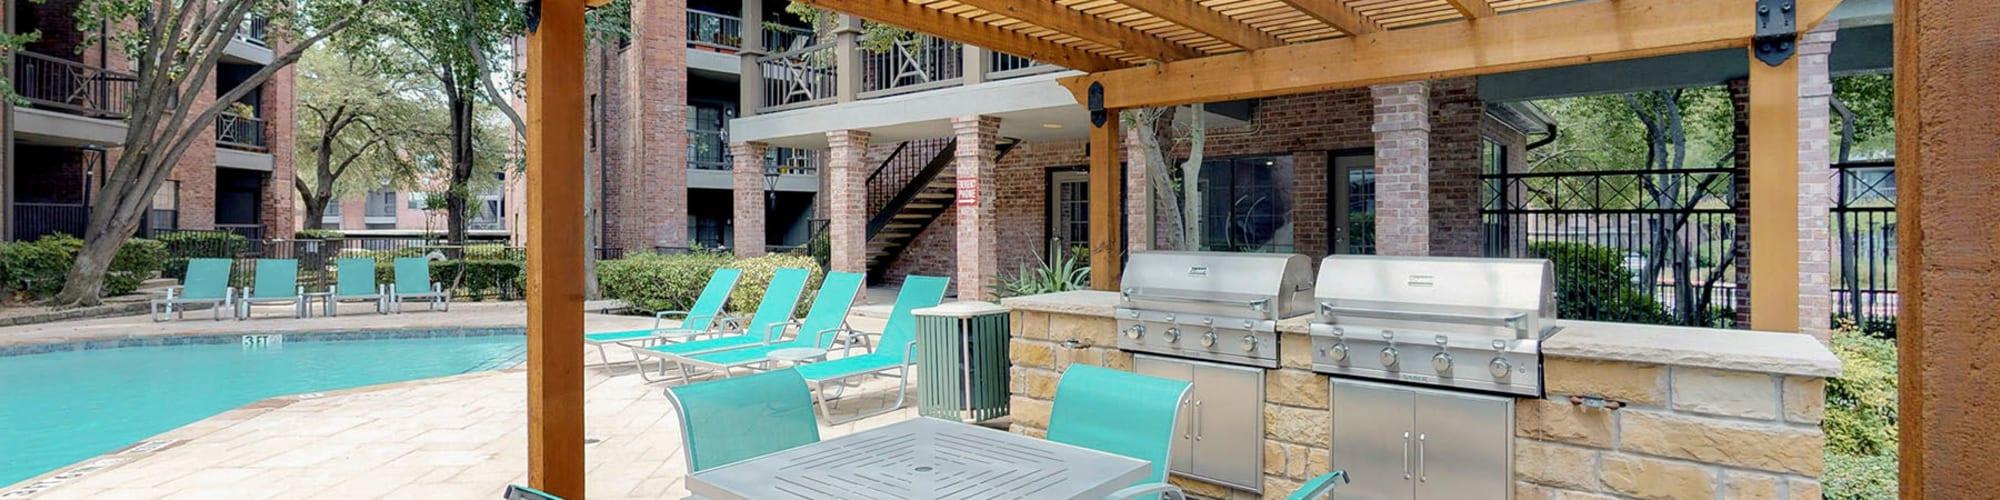 Reviews of Oaks Hackberry Creek in Irving, Texas